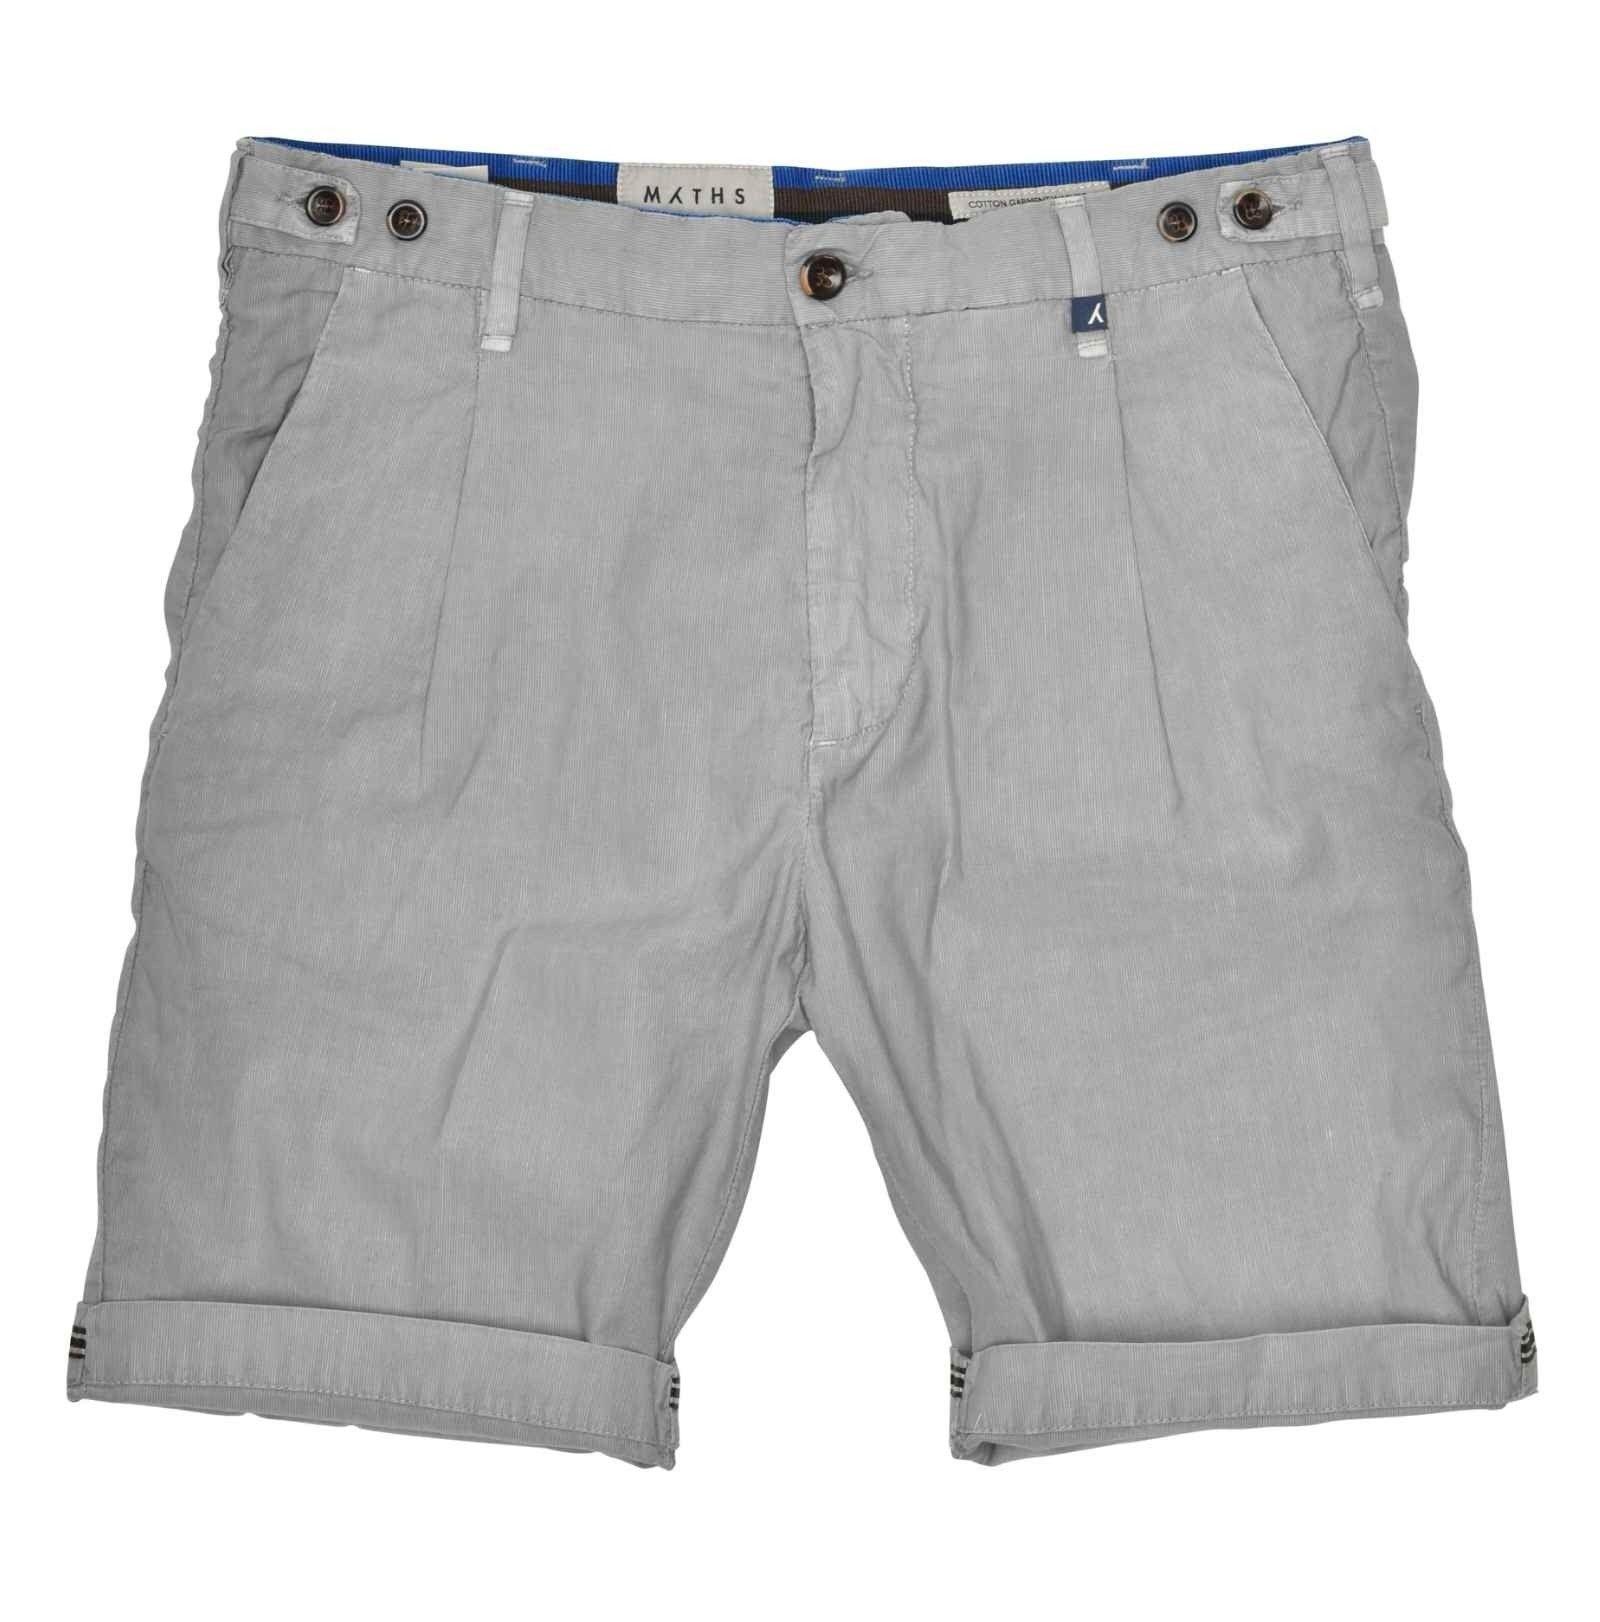 MYTHS - Herren Shorts - Short Trousers - Grigio